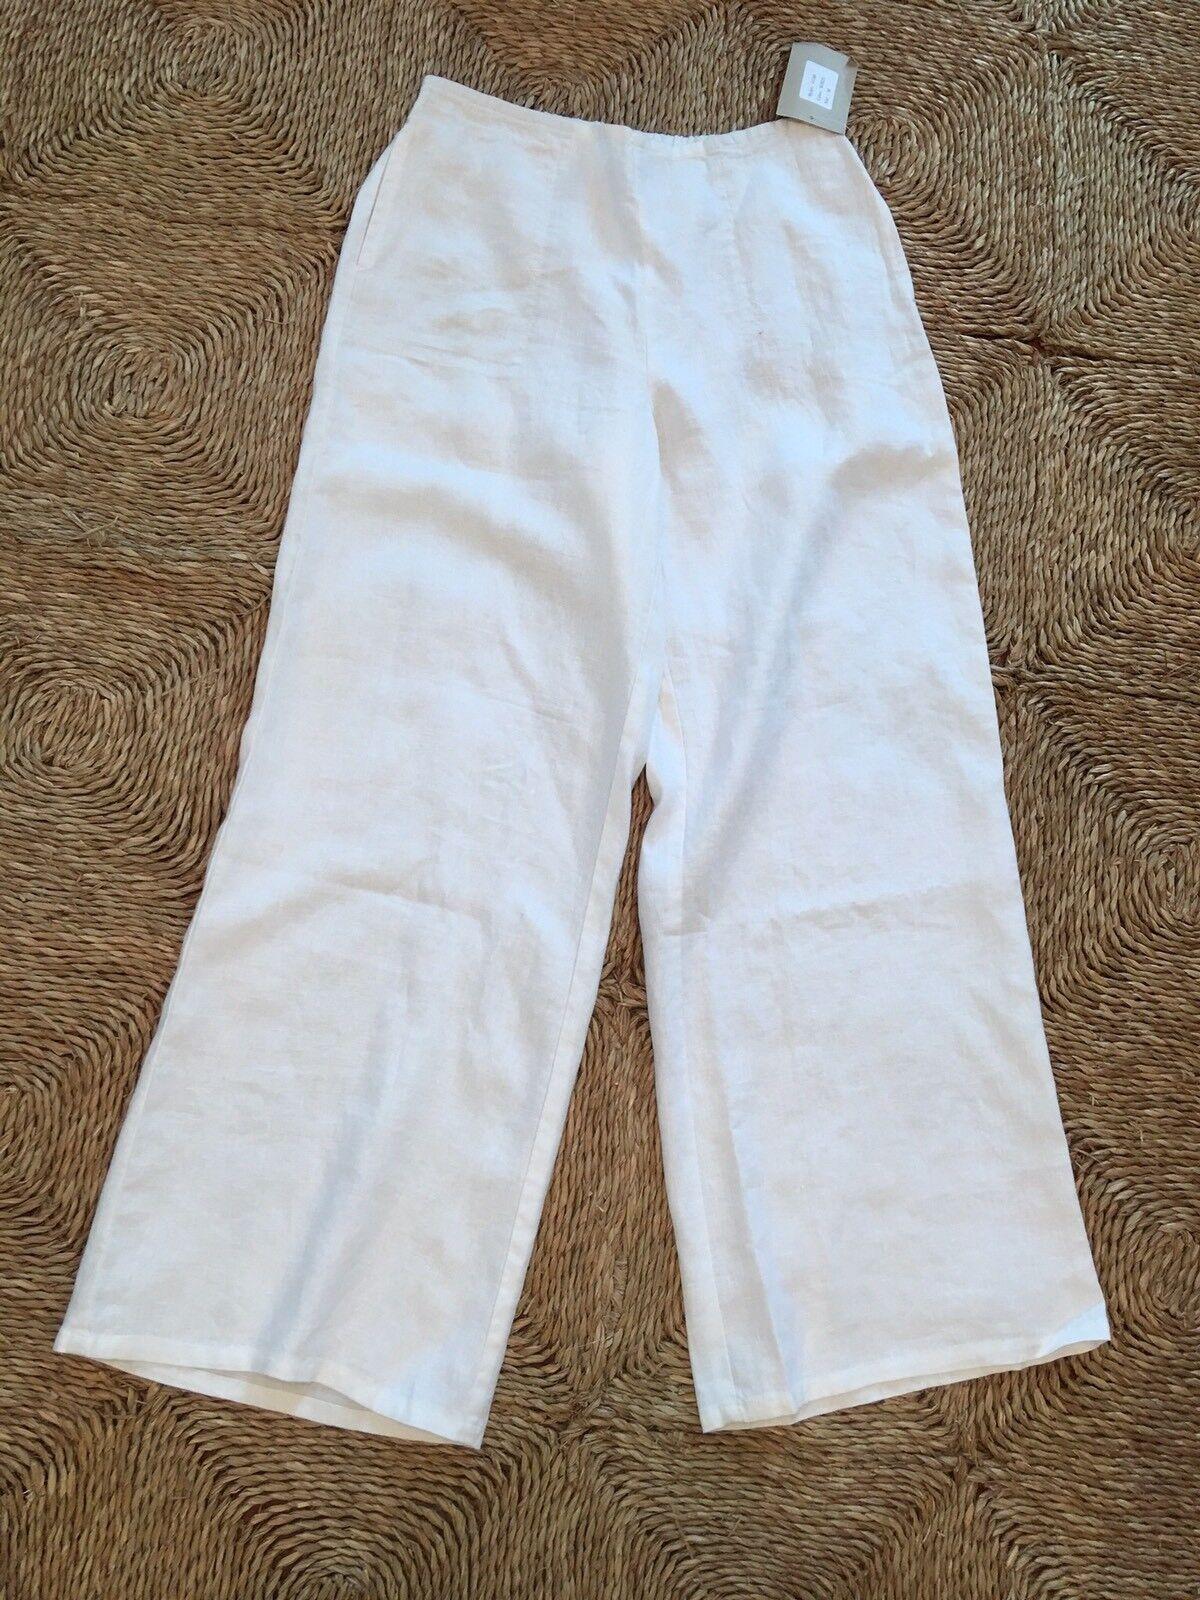 Habitat White Linen Pants .Size M.NWT.